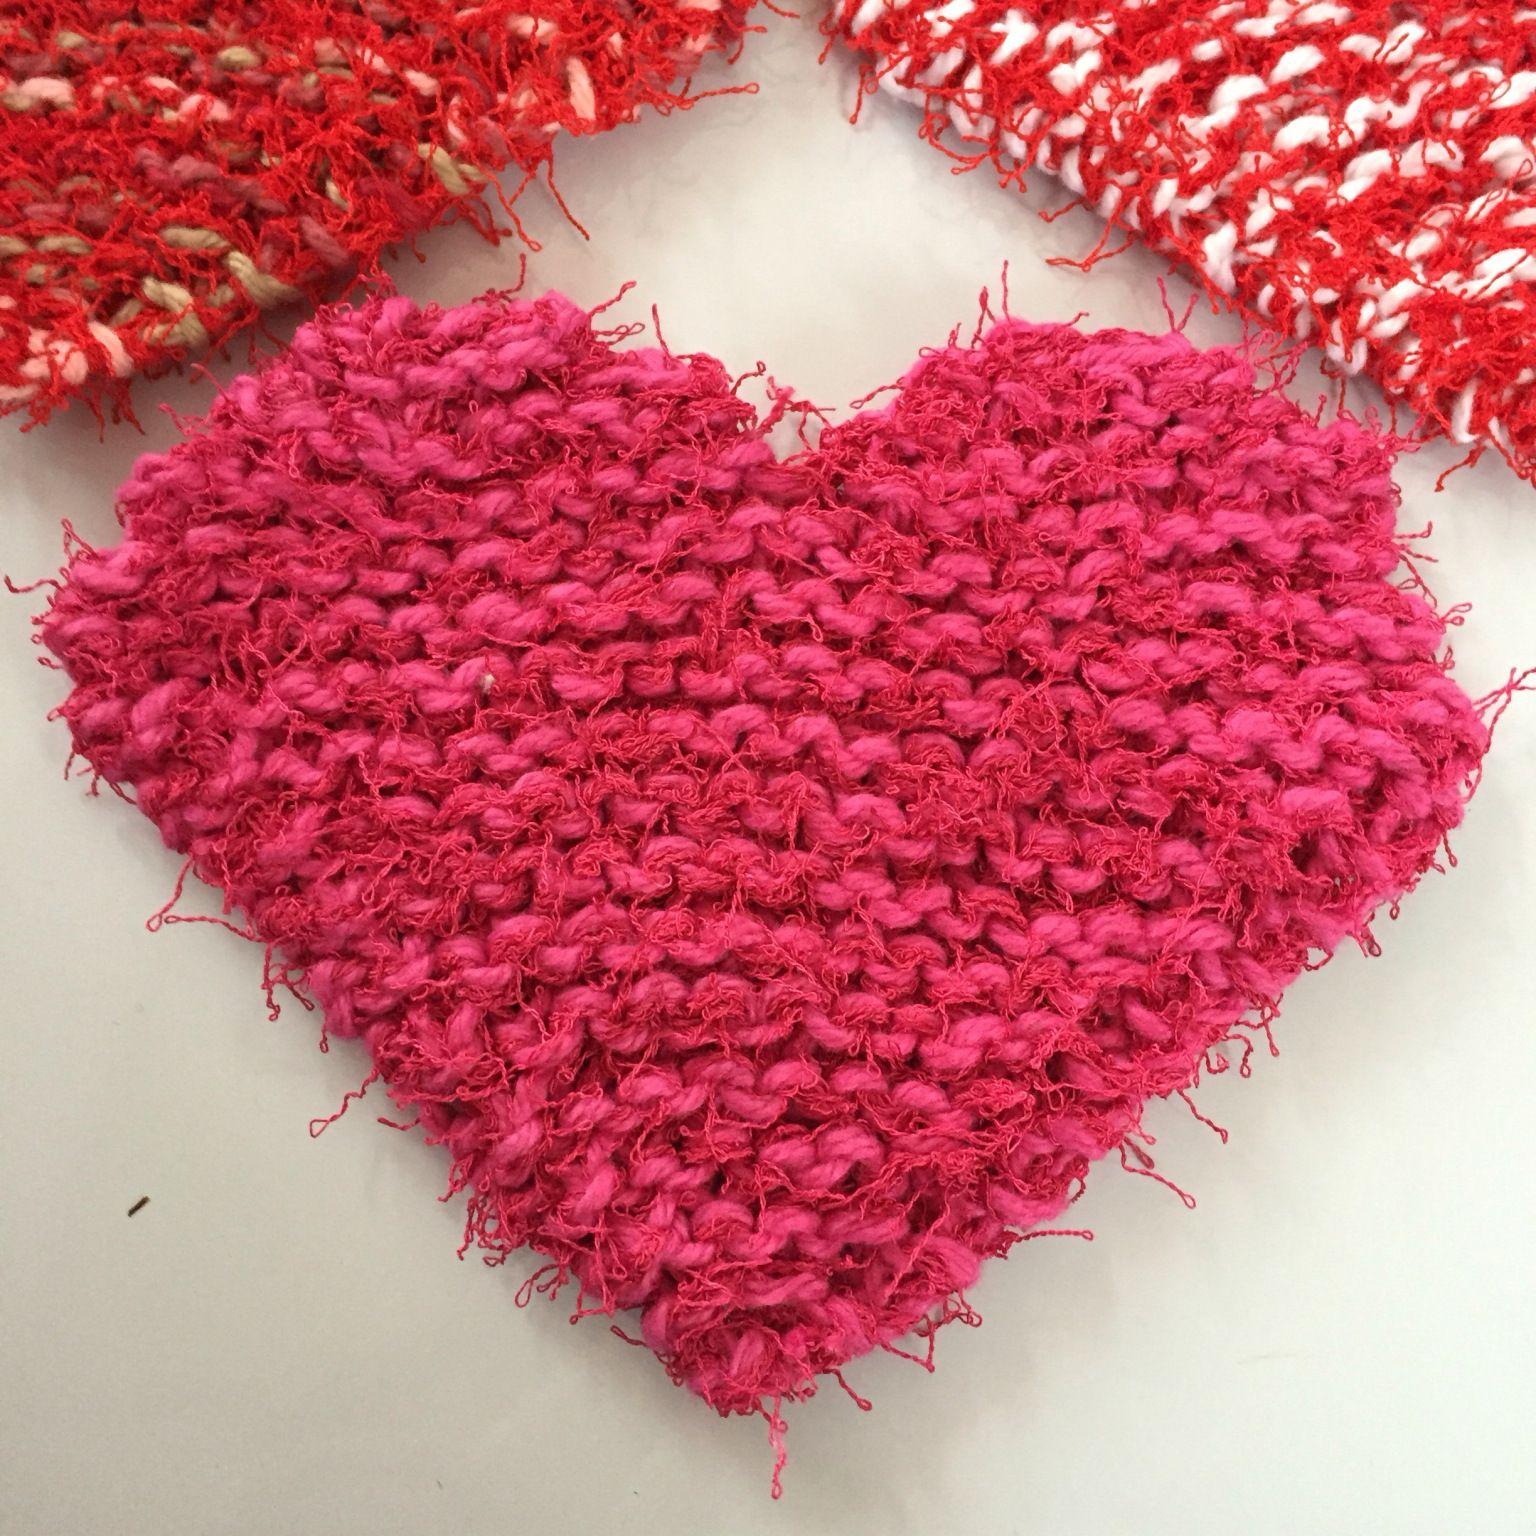 Valentine heart scrubby pattern best scrubby yarn garter stitch an easy garter stitch heart knitting pattern using the polyester scrubby yarn bankloansurffo Image collections